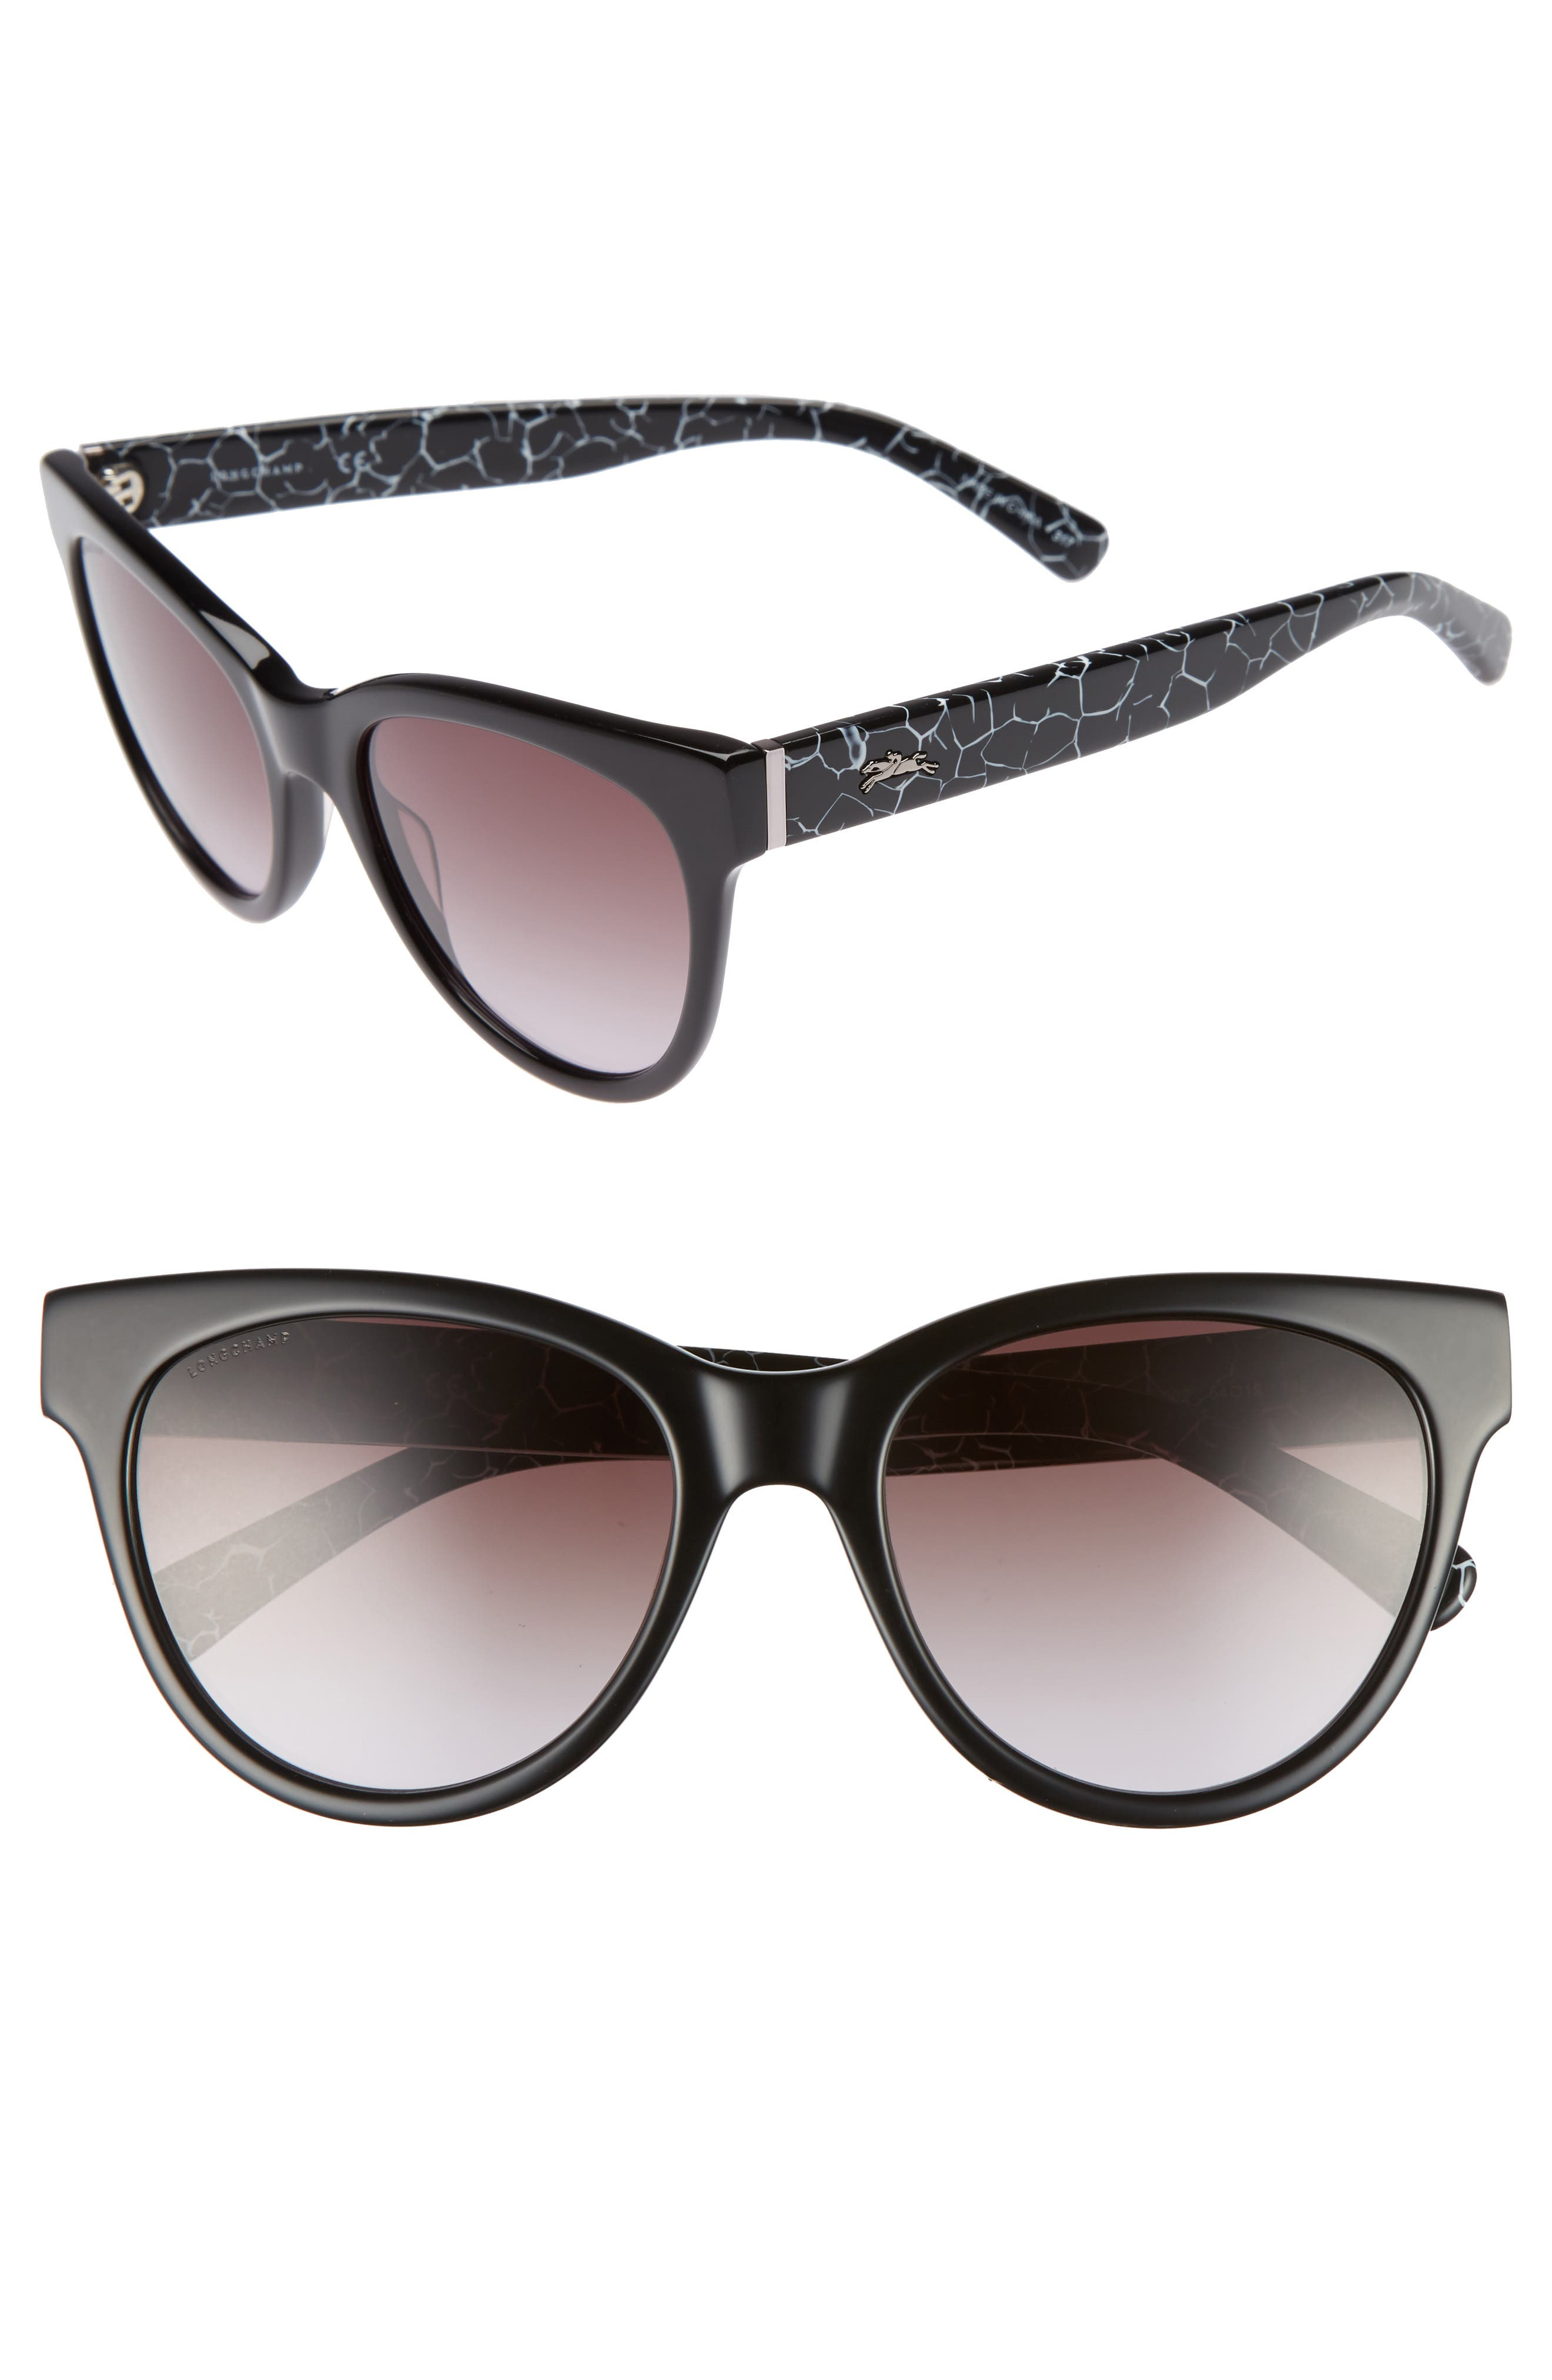 54mm Gradient Lens Cat Eye Sunglasses,                         Main,                         color, MARBLE BLACK